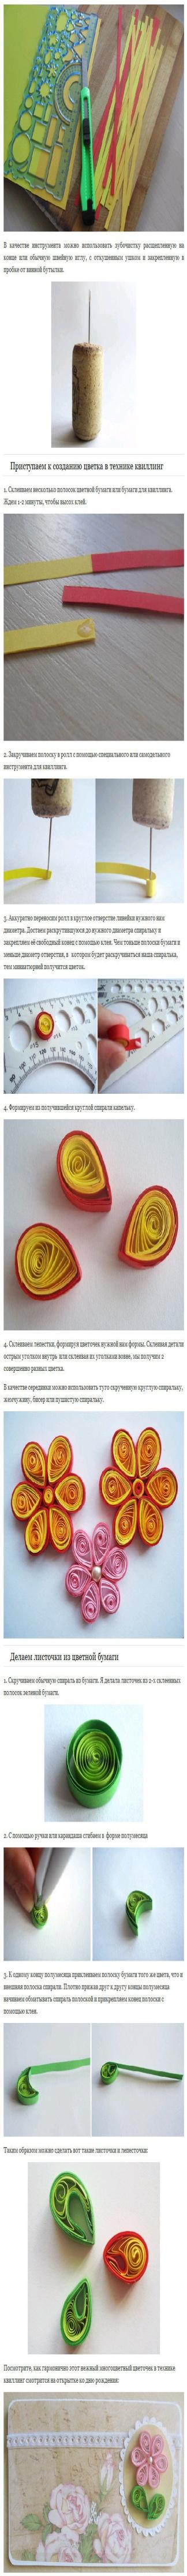 C:\Users\бю\Desktop\kvilling-shemy-svetov (1).jpg